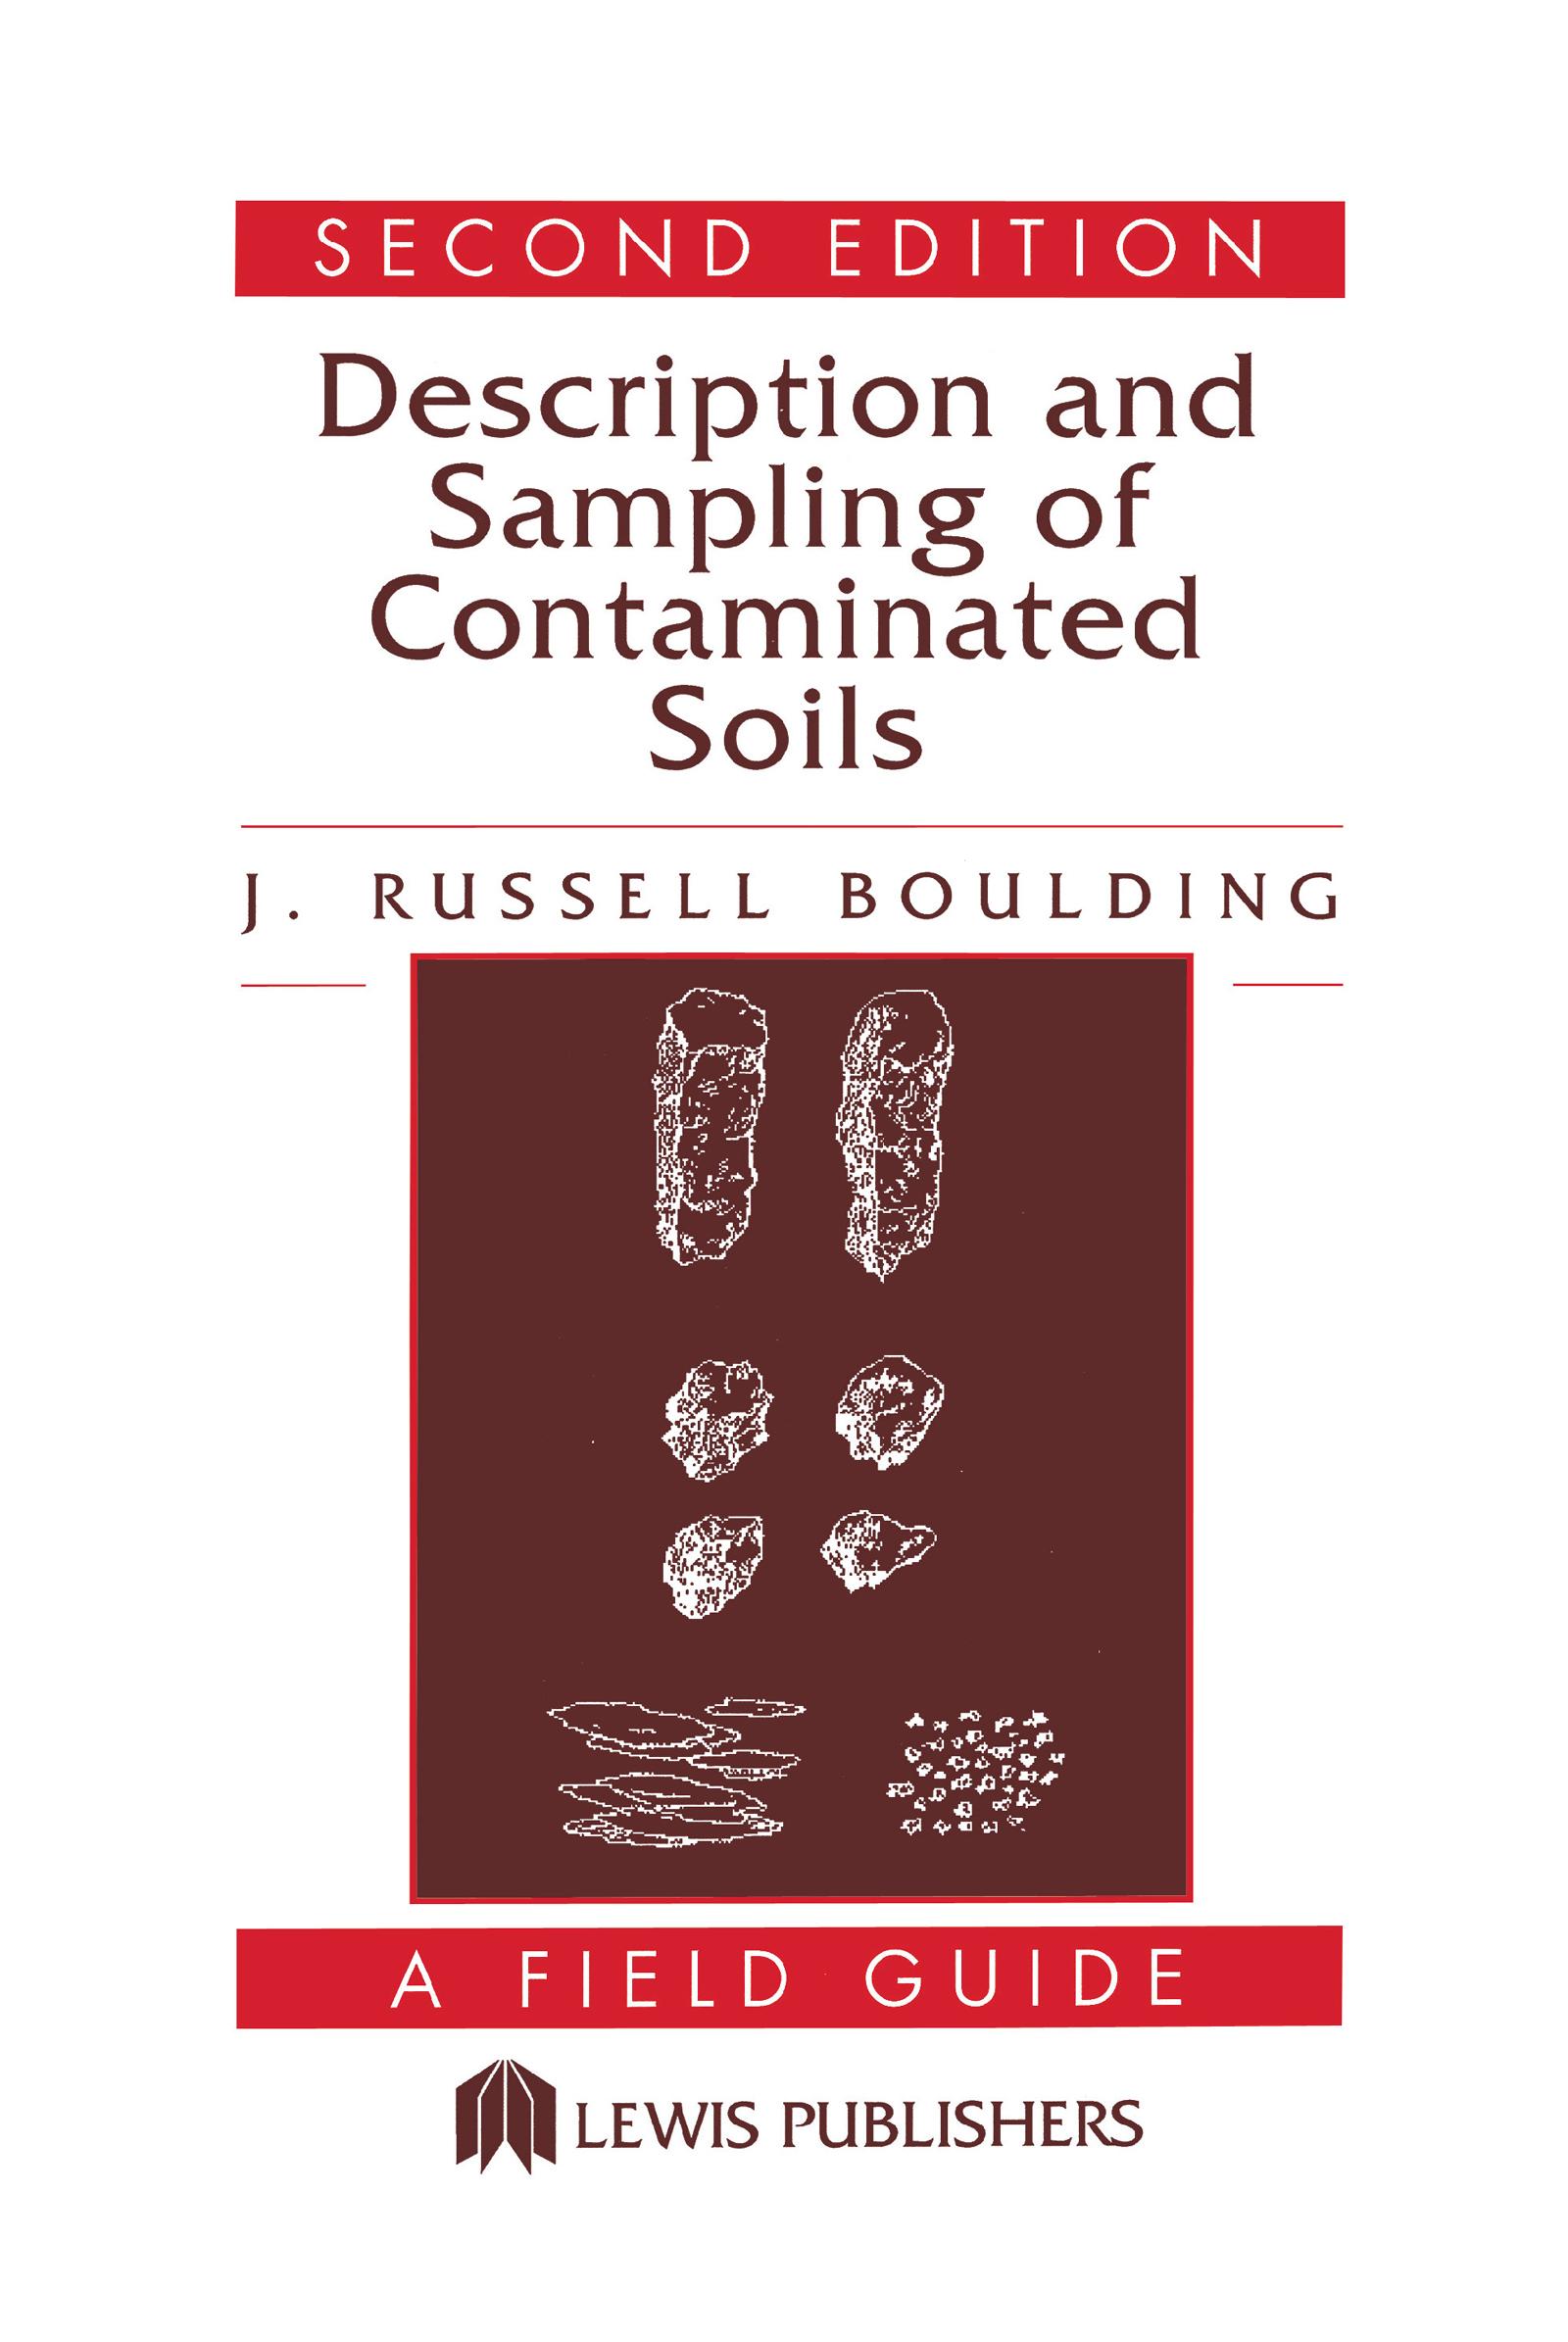 Description and Sampling of Contaminated Soils